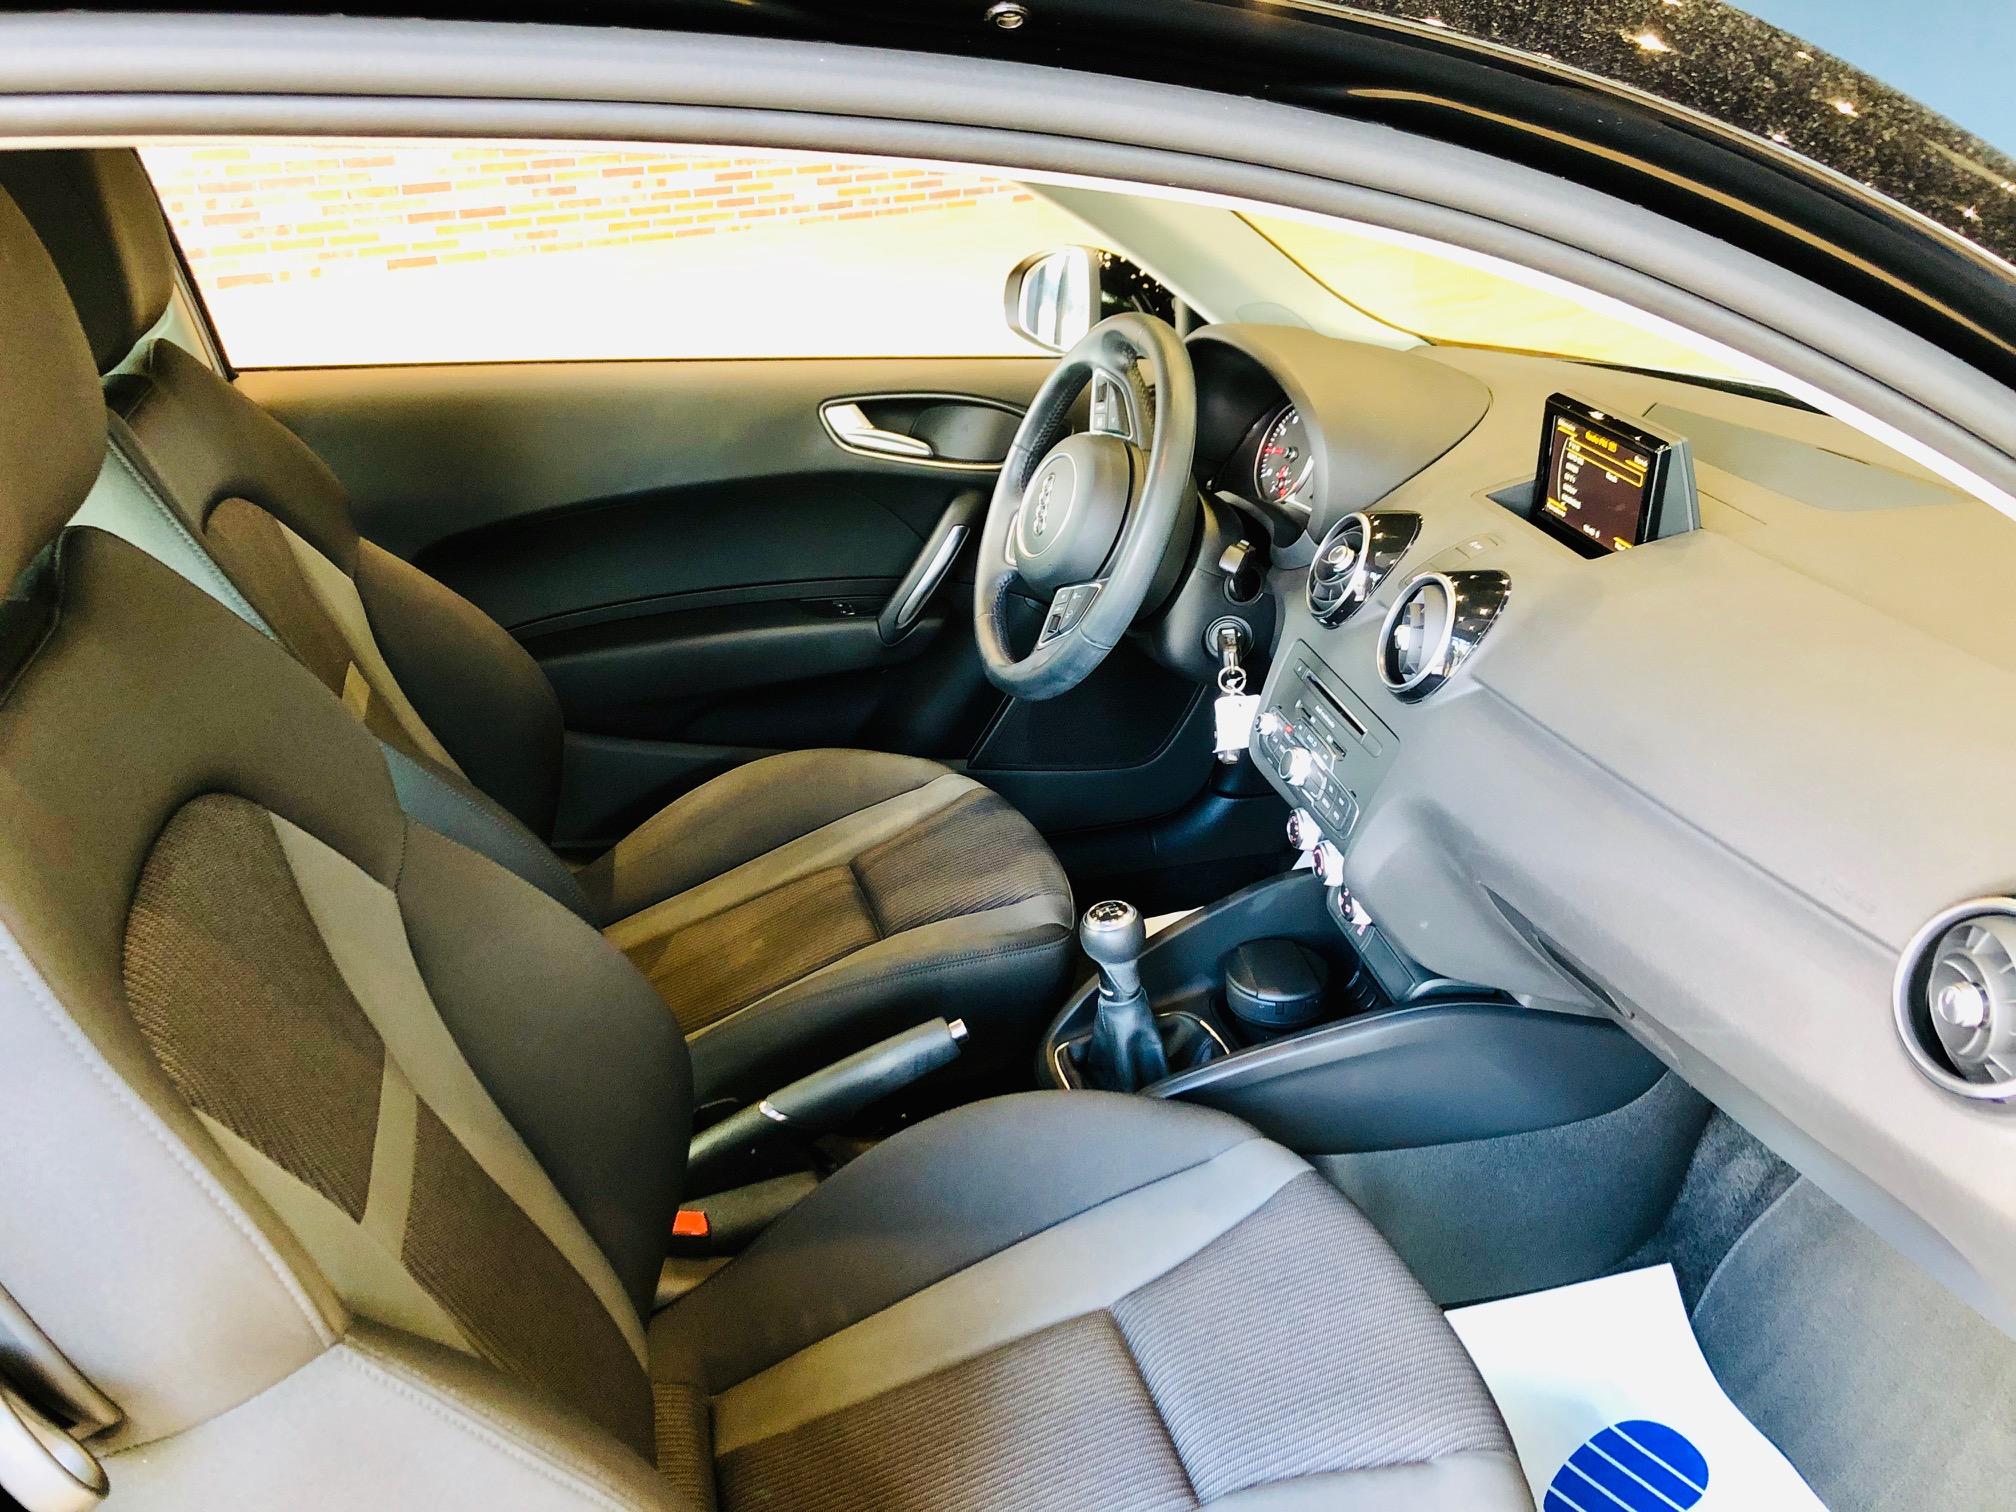 Occasion Audi A1 1.0 Tfsi 95cv Ultra Face Avant Gauche